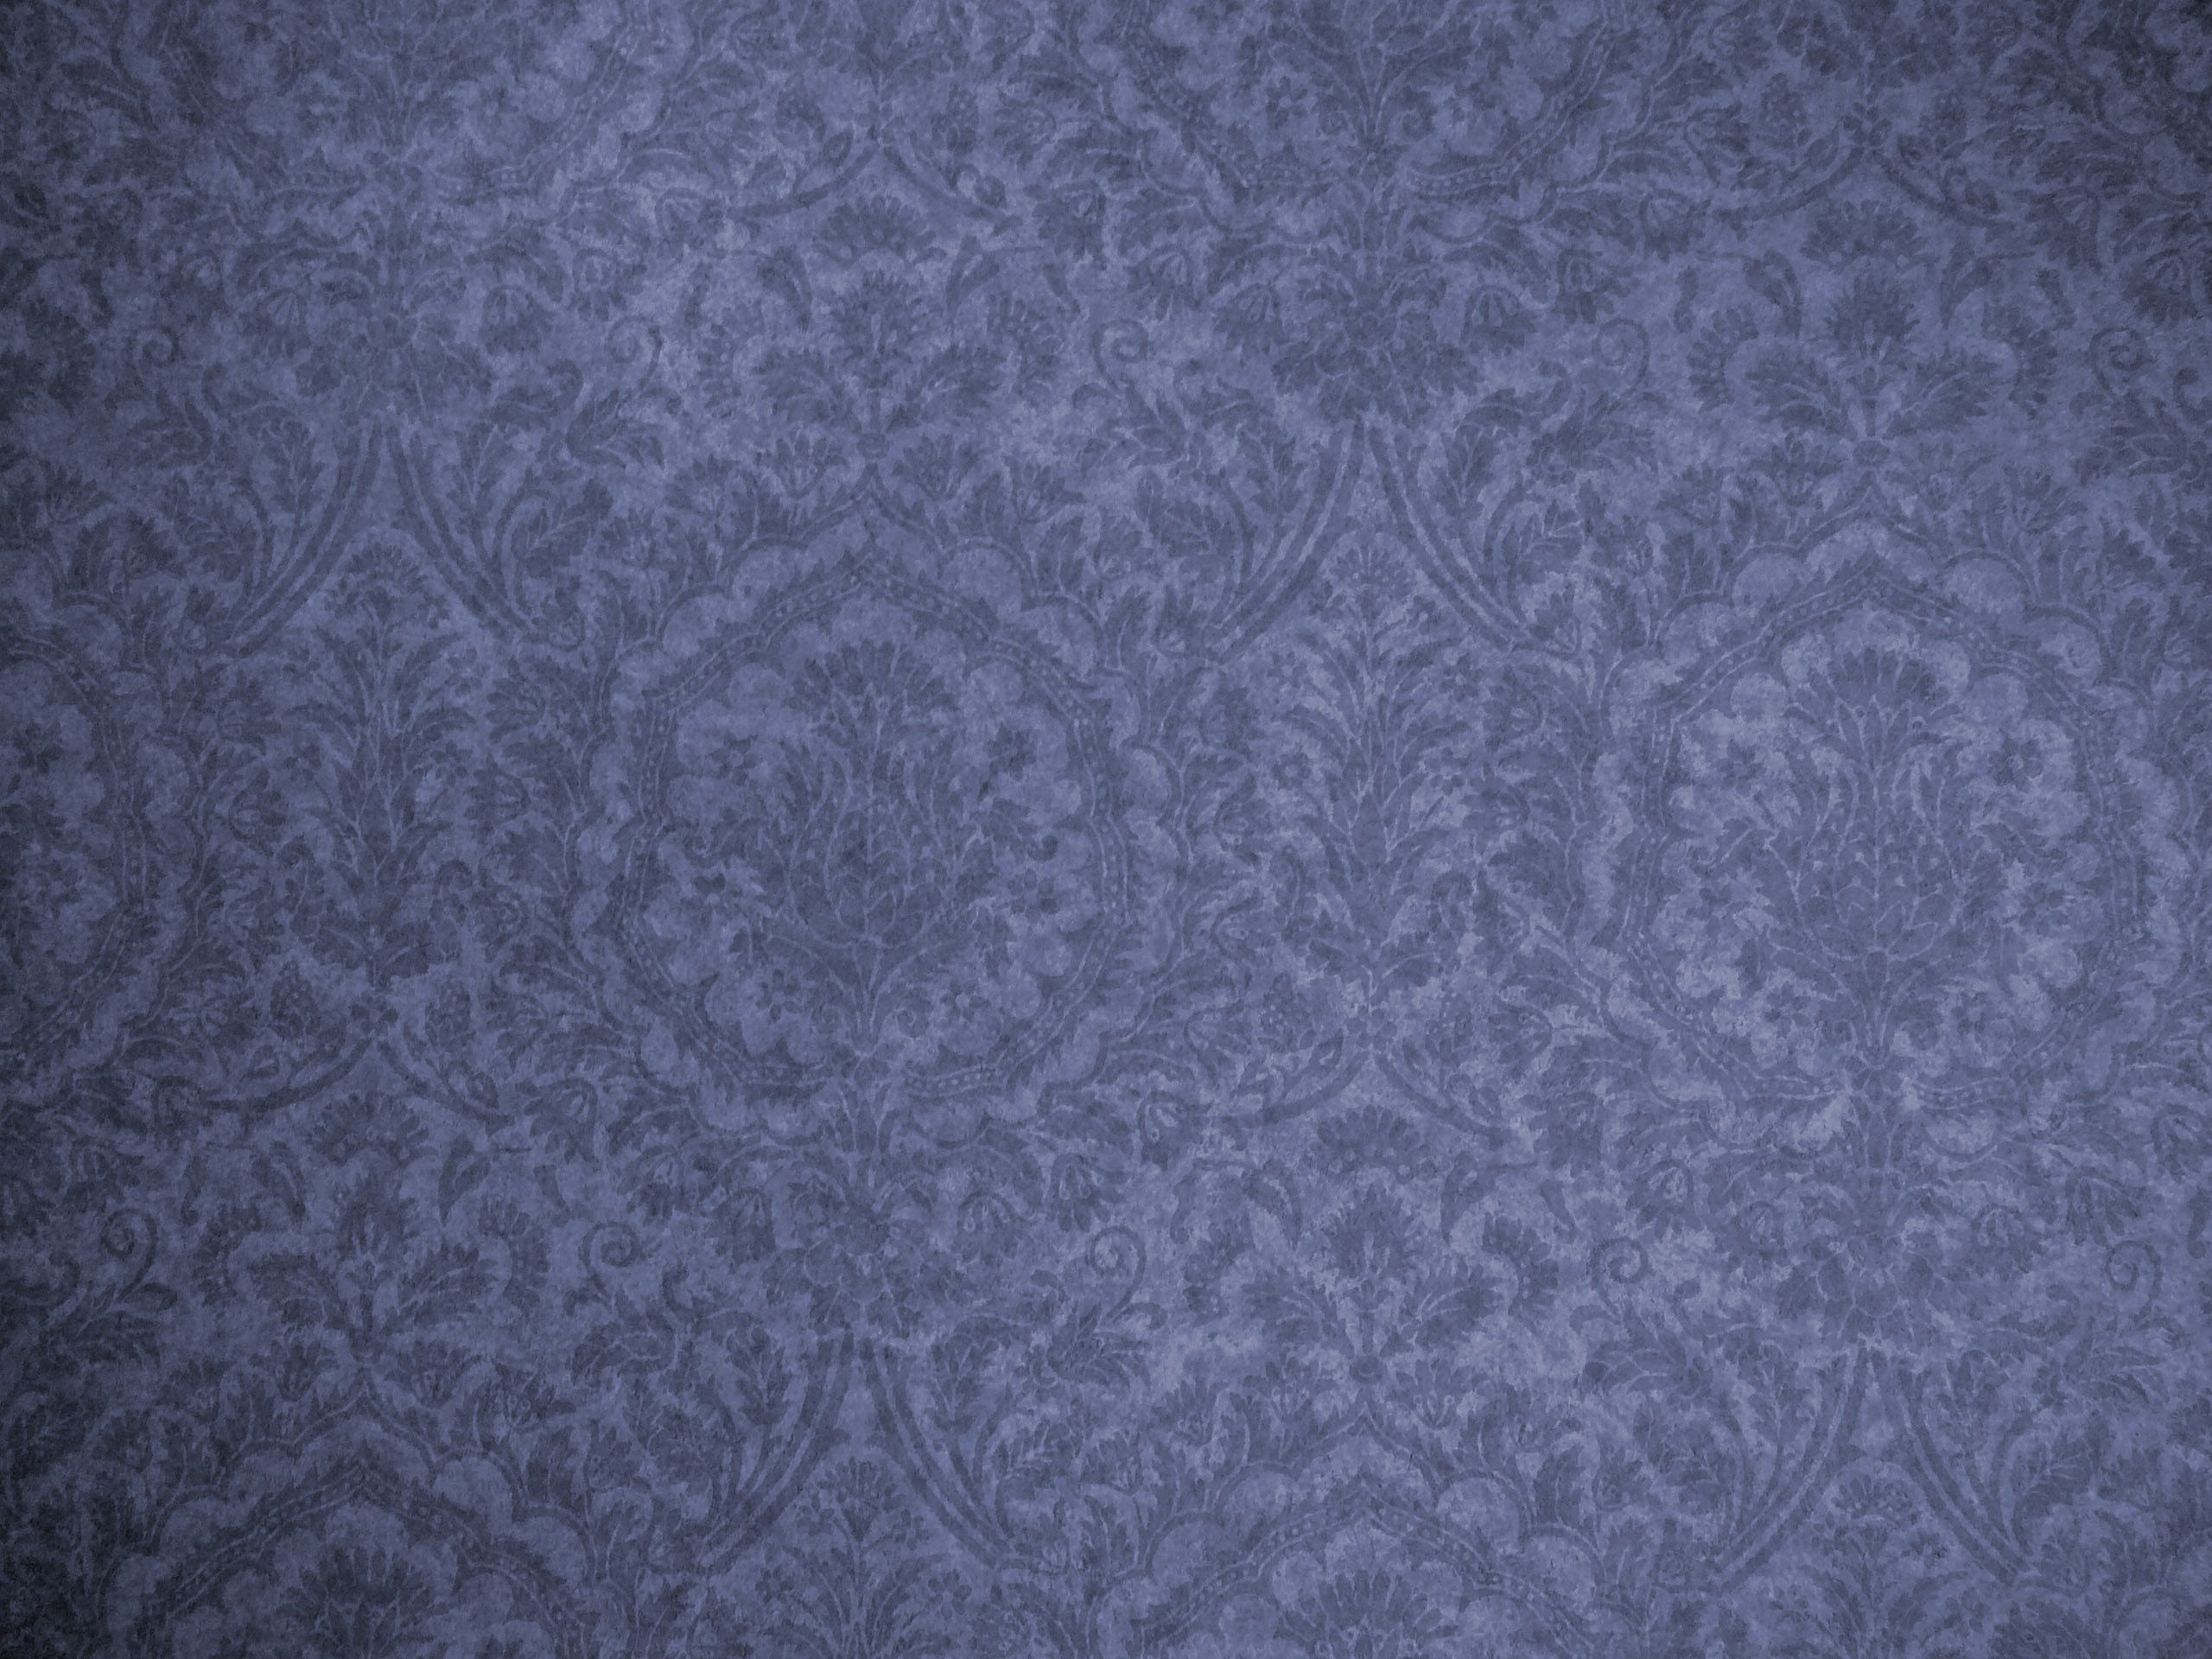 Best Old Wallpaper Patterns Old Wallpaper Textured Wallpaper 400 x 300